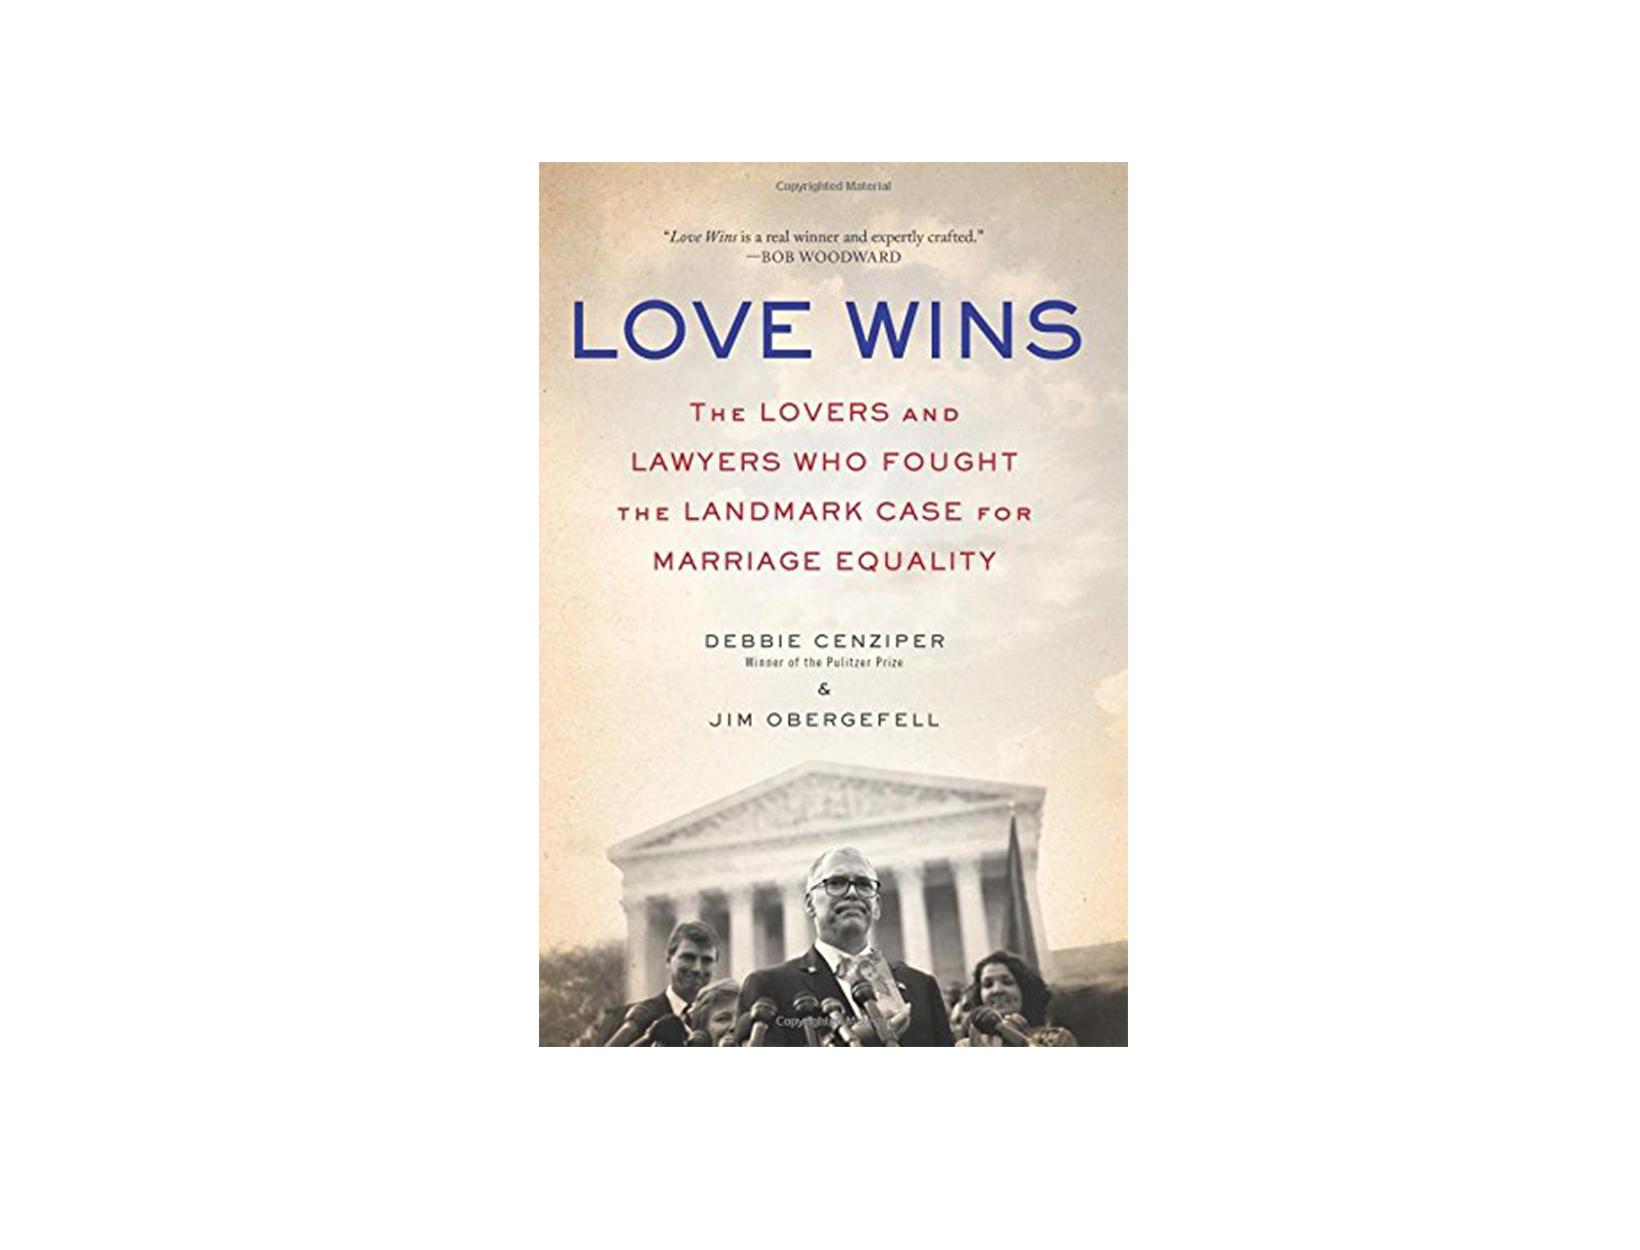 Love Wins by Debbie Cenziper & Jim Obergefell